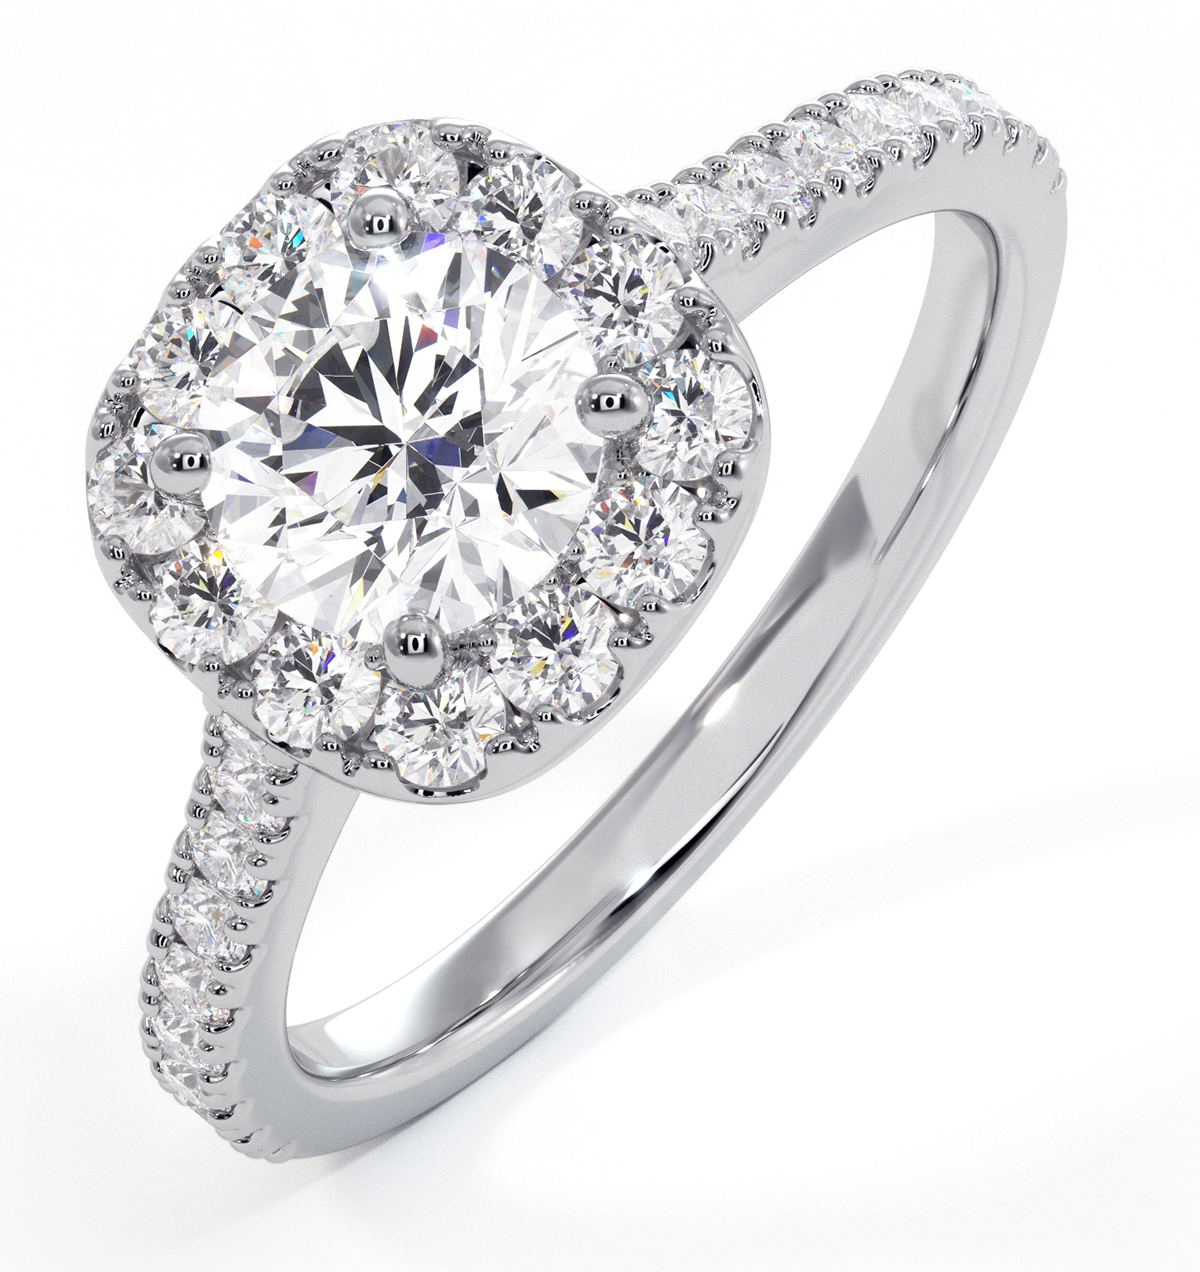 Elizabeth GIA Diamond Halo Engagement Ring in Platinum 1.30ct G/VS2 - image 1